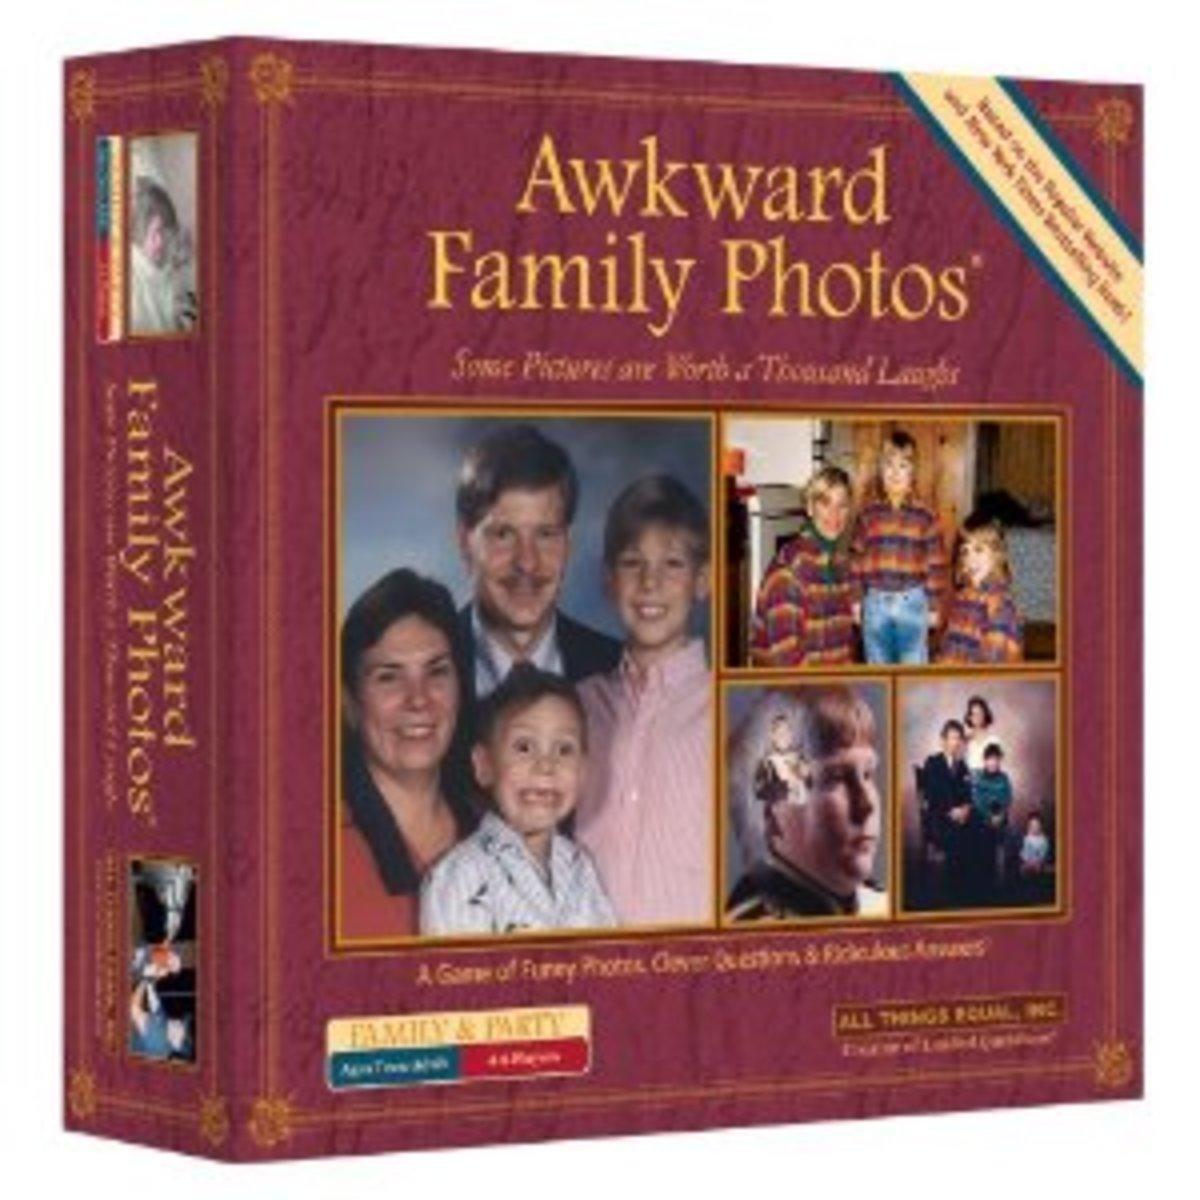 Top Ten Family Board Games